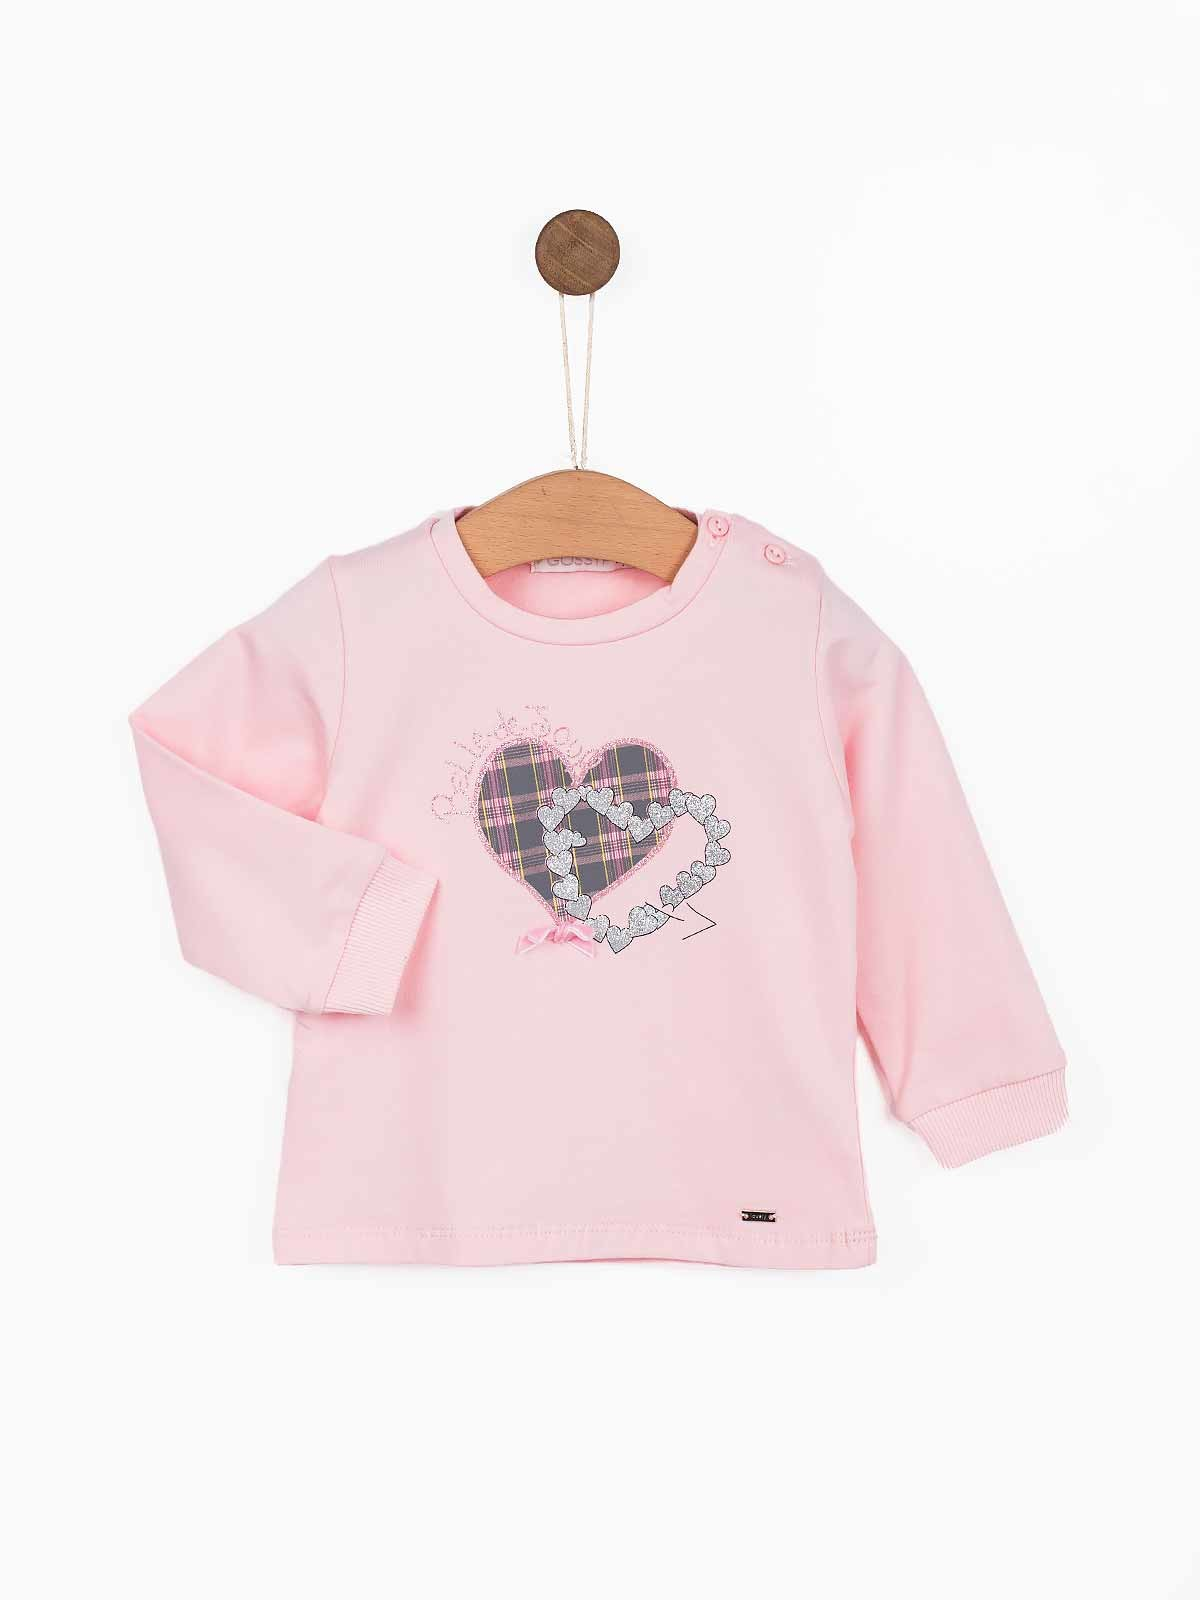 Camisola manga comprida corações